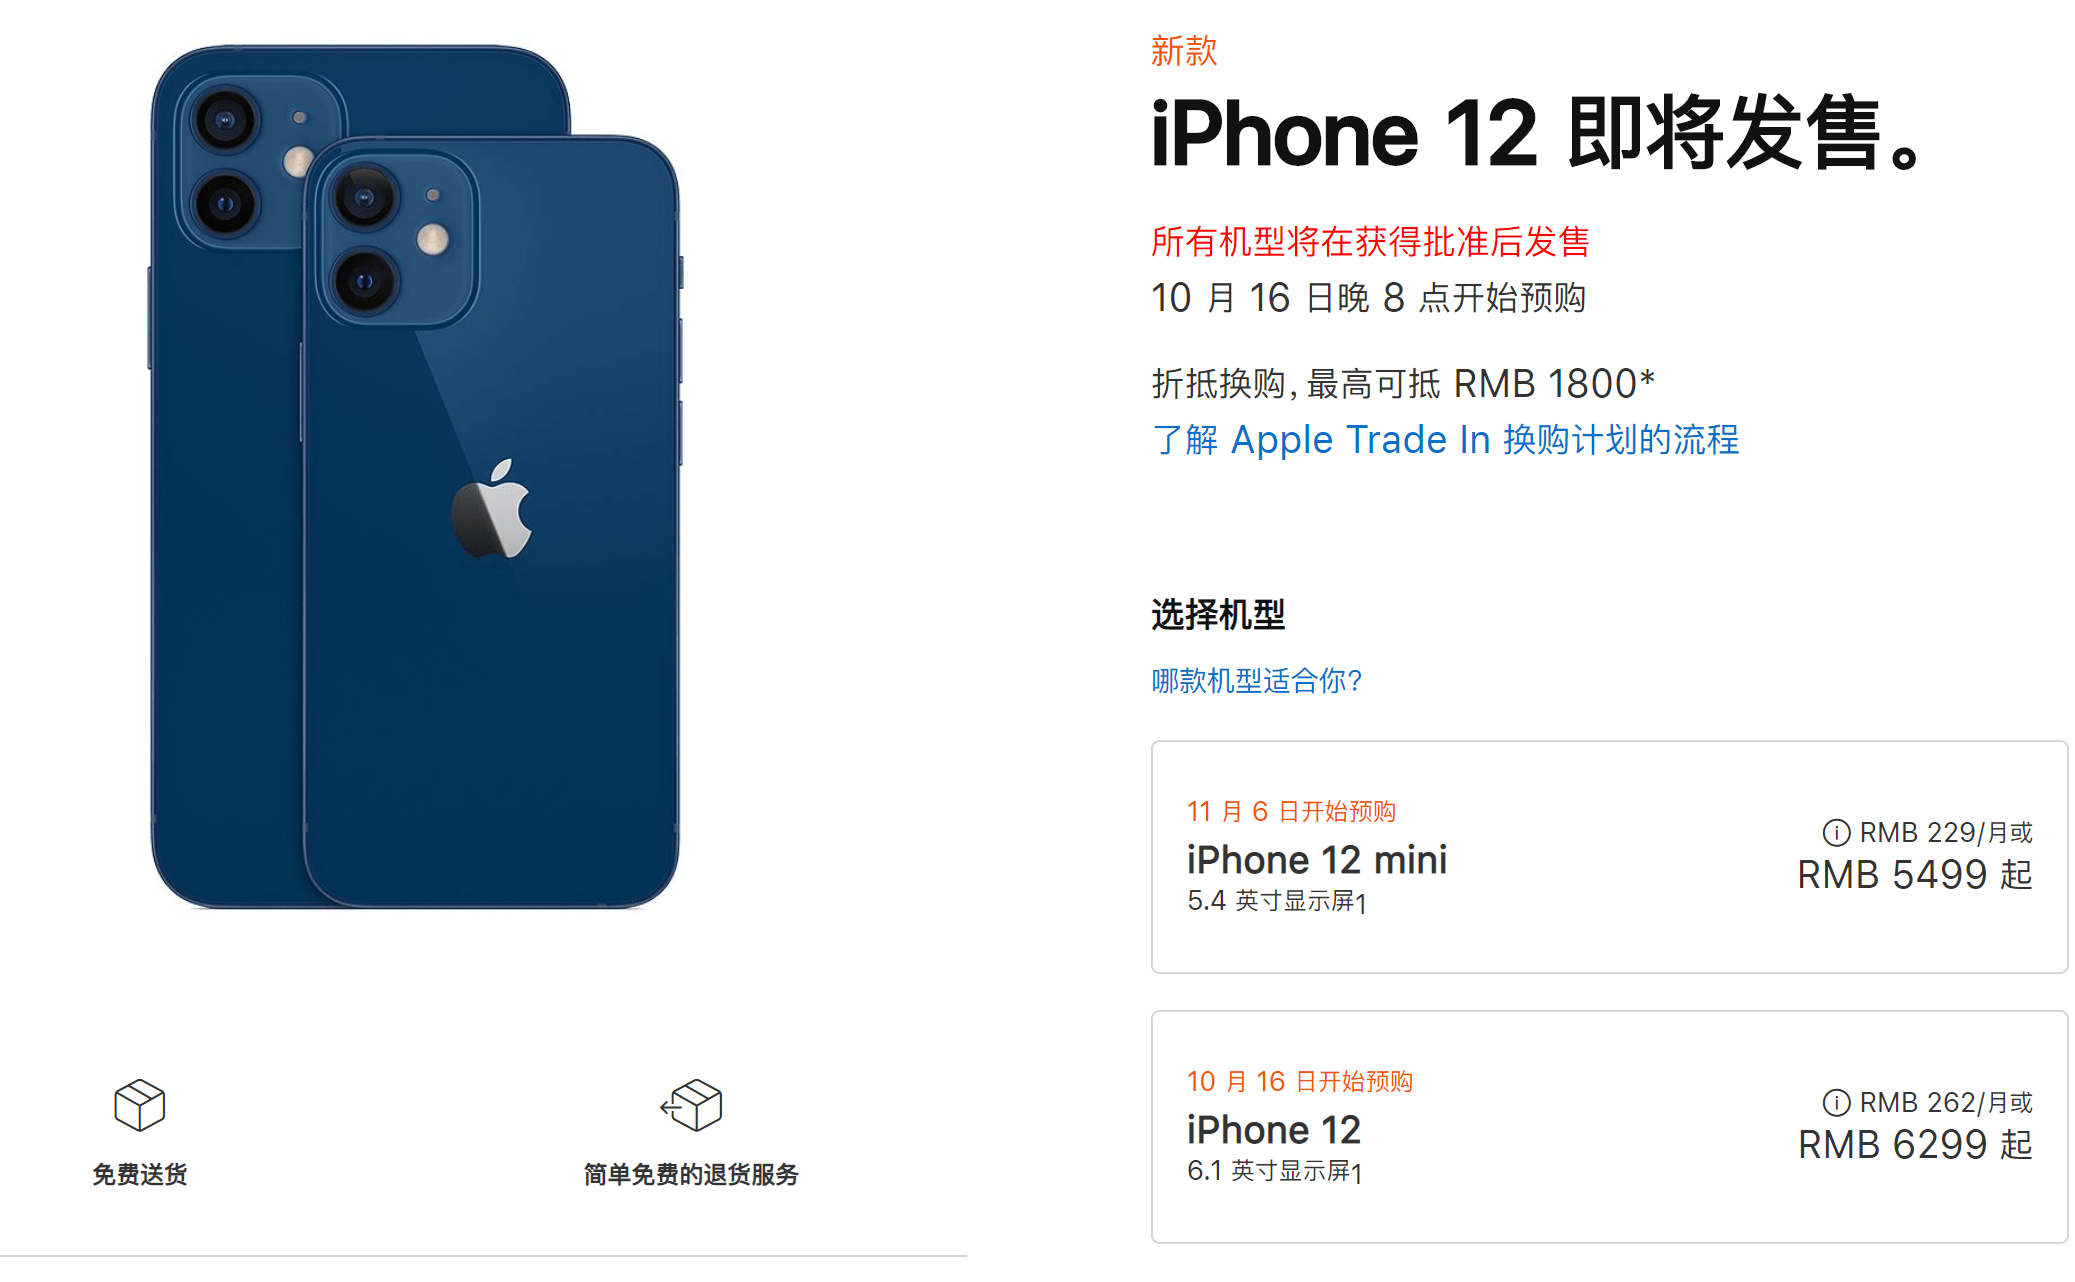 iPhone 12系列国行价格公布:最低5499元,顶配11899元的照片 - 2